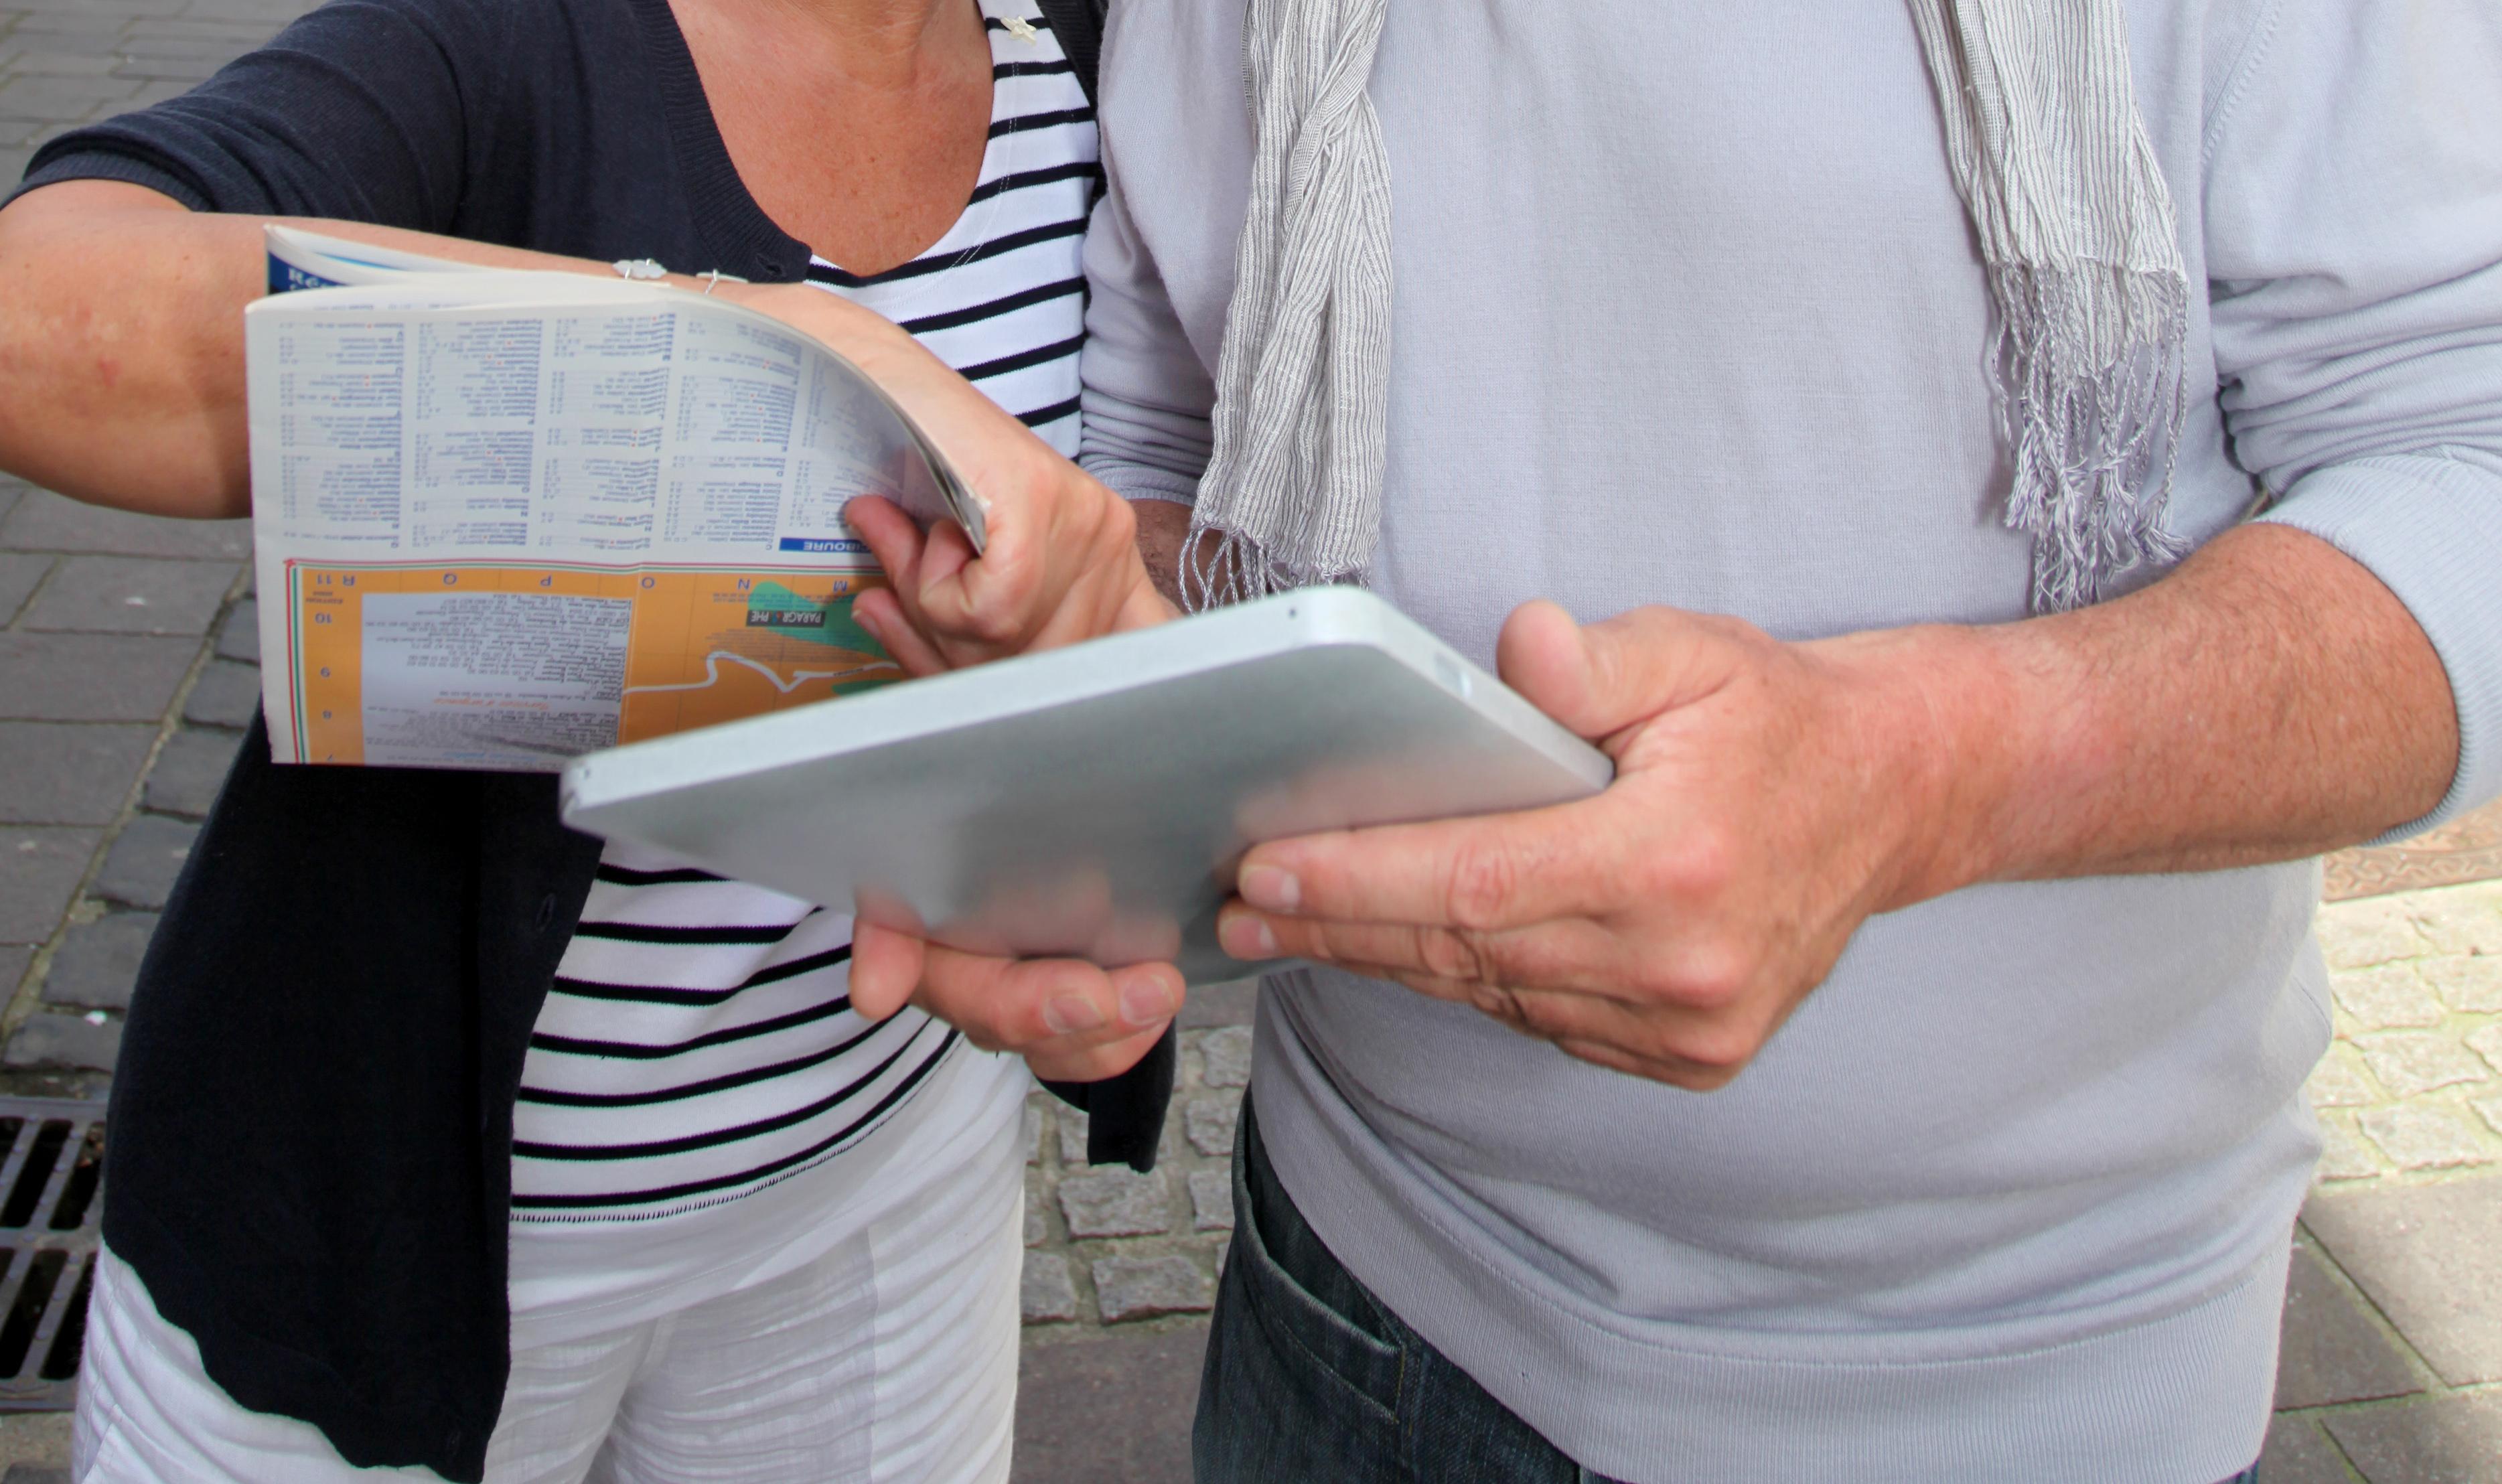 Tablet Teamevent in Kiel